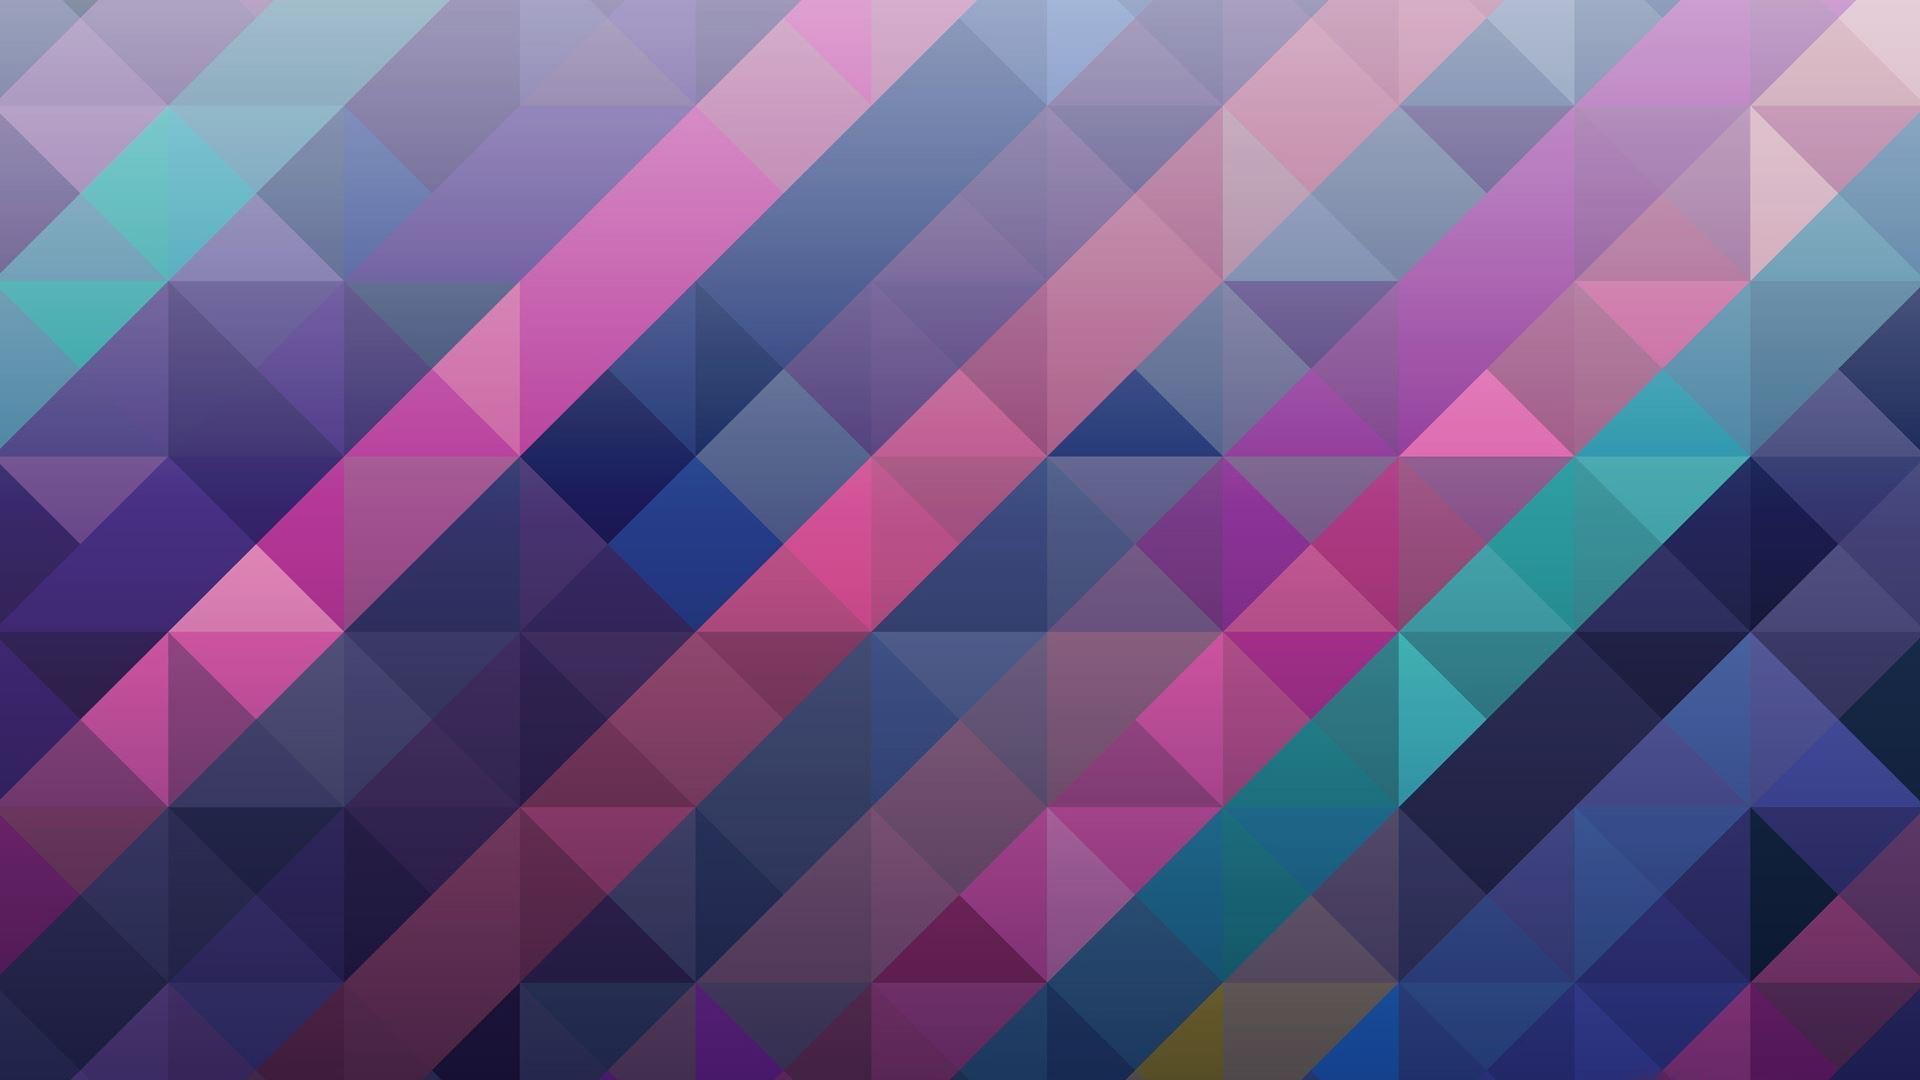 Abstract Wallpaper For Mac Mac Wallpaper Download